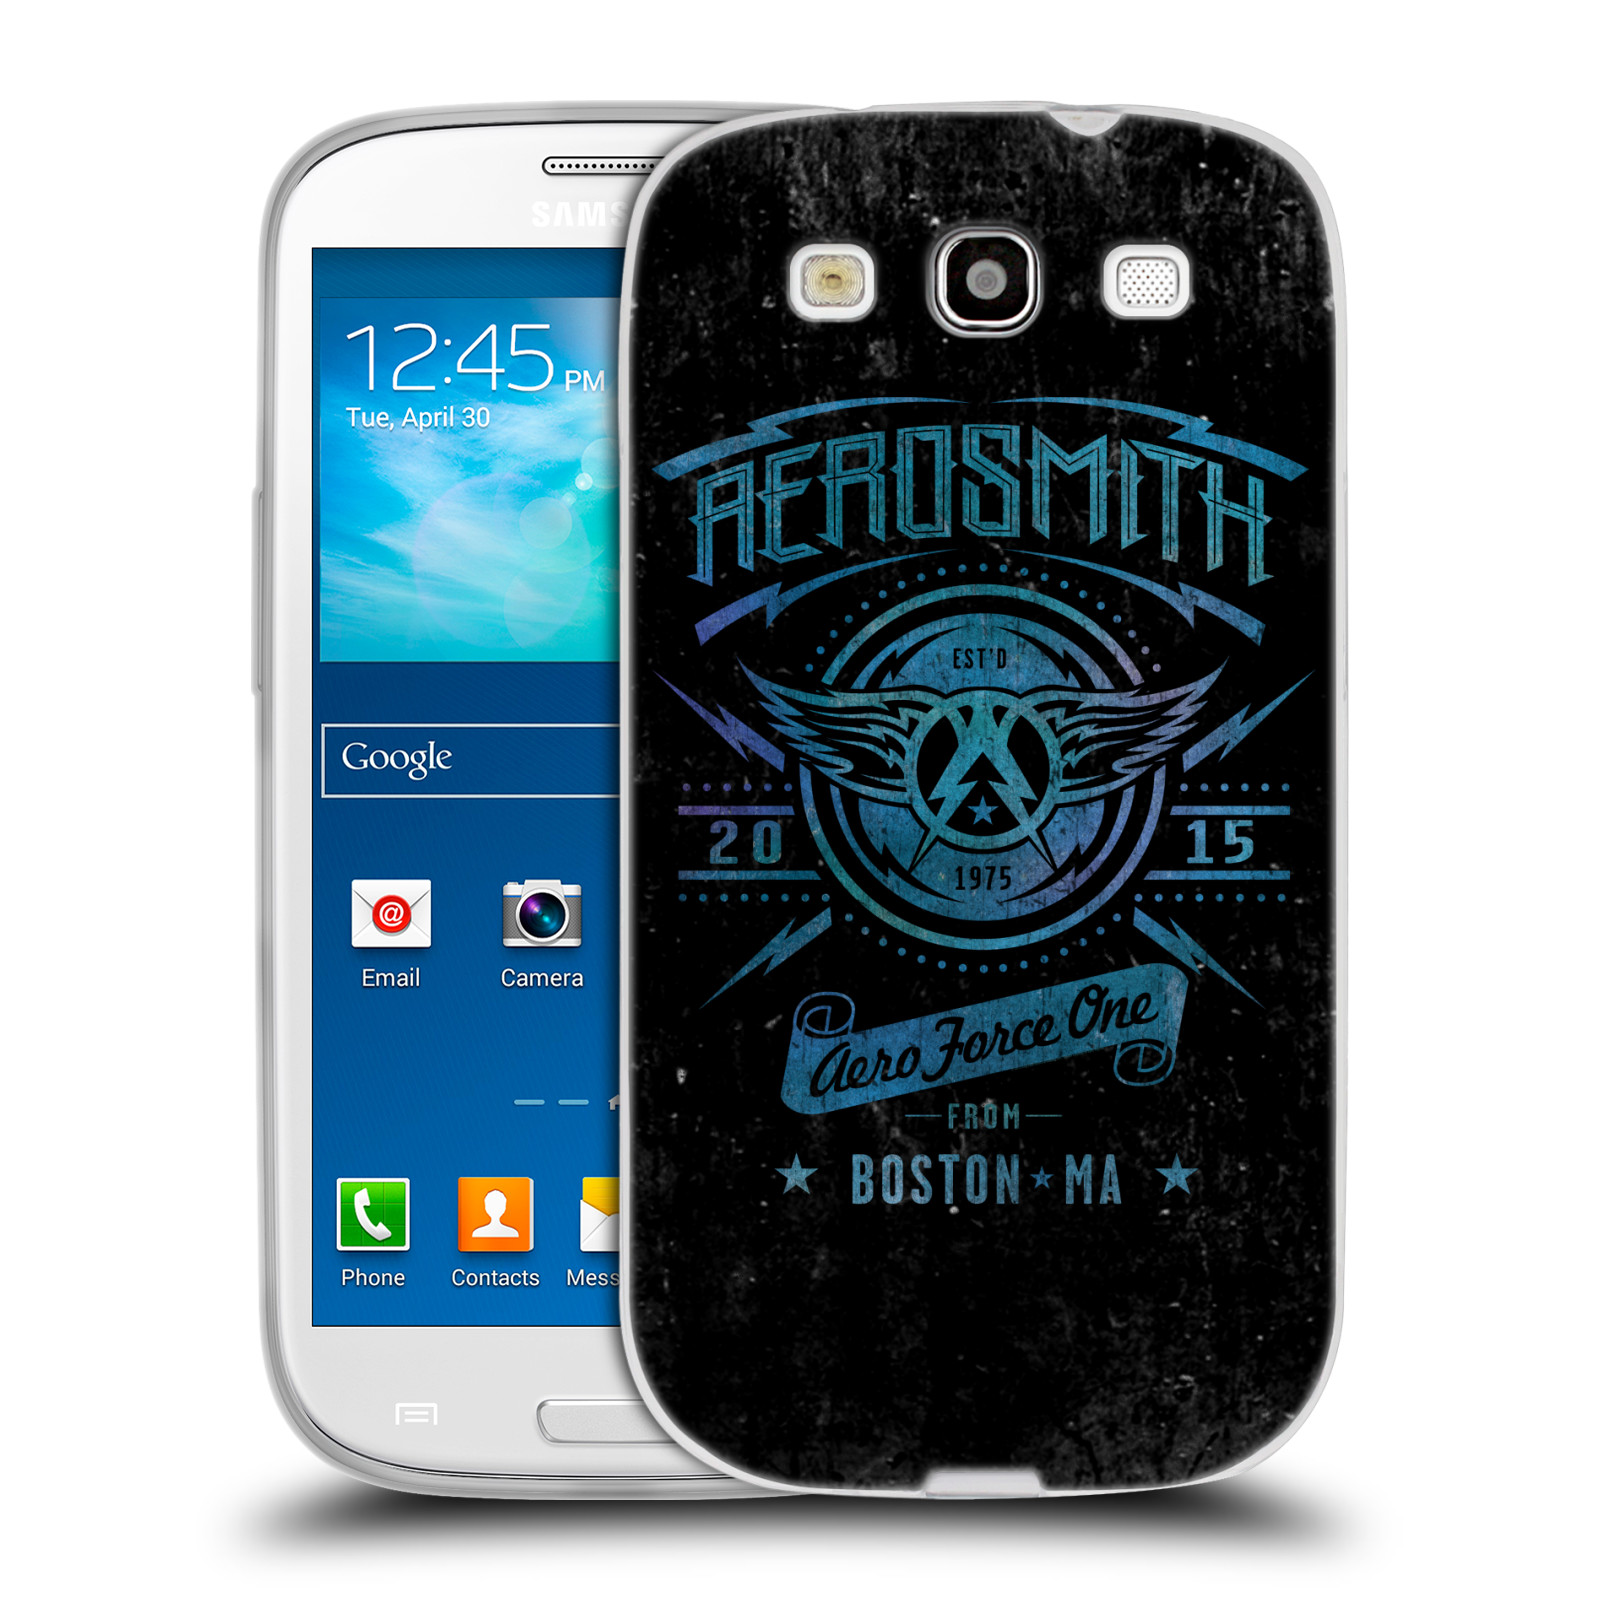 Silikonové pouzdro na mobil Samsung Galaxy S3 Neo HEAD CASE - Aerosmith - Aero Force One